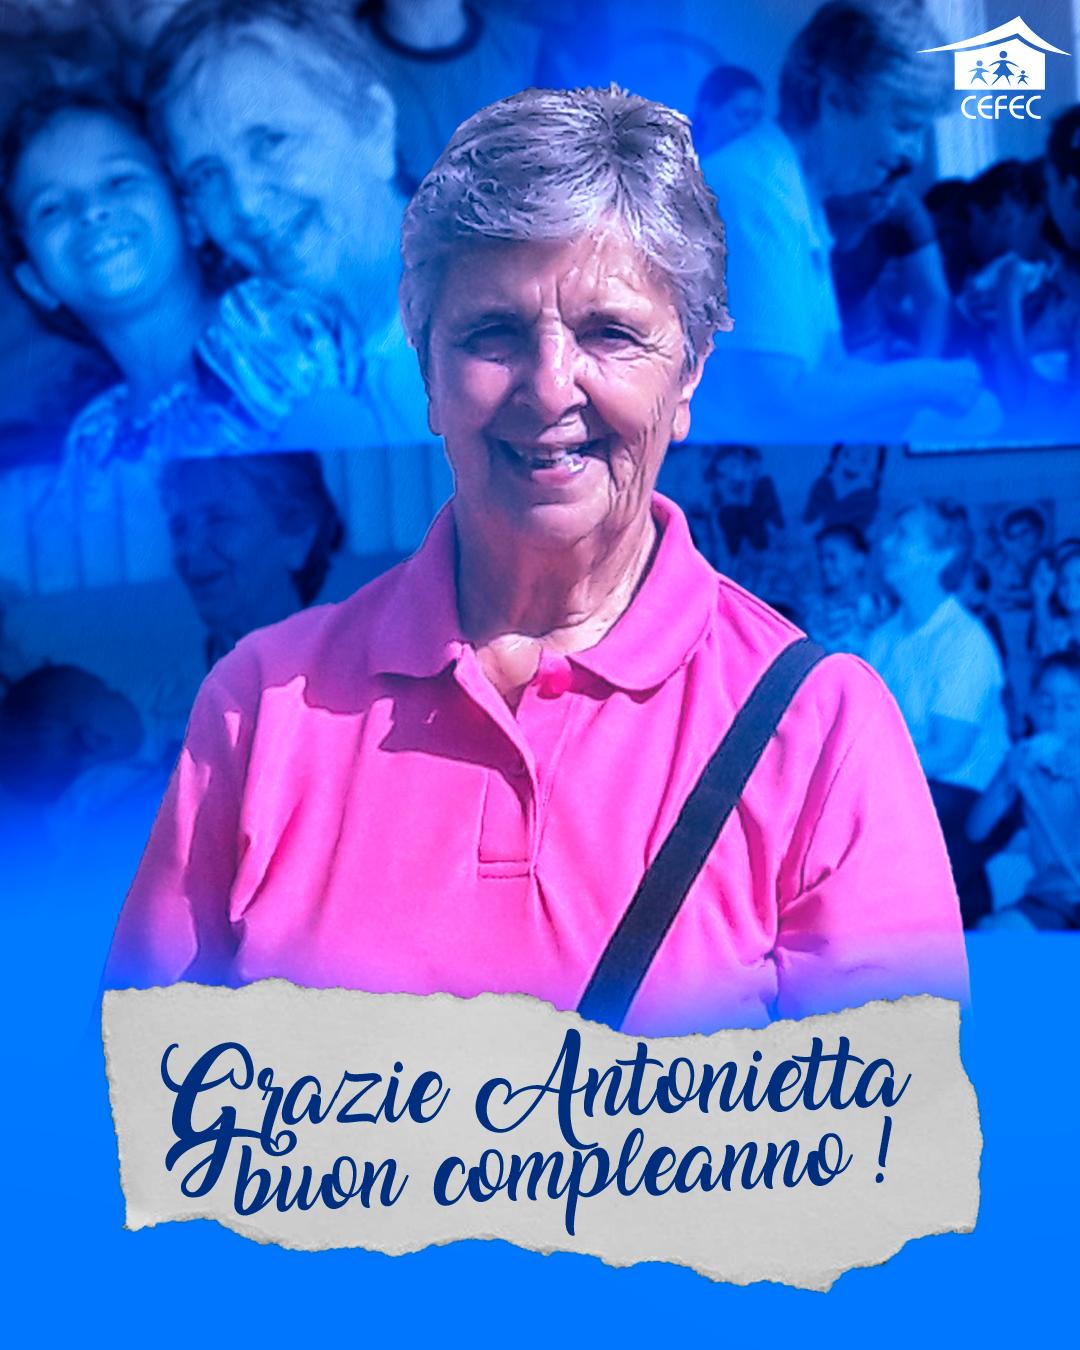 Aniversário da Irmã Antonietta